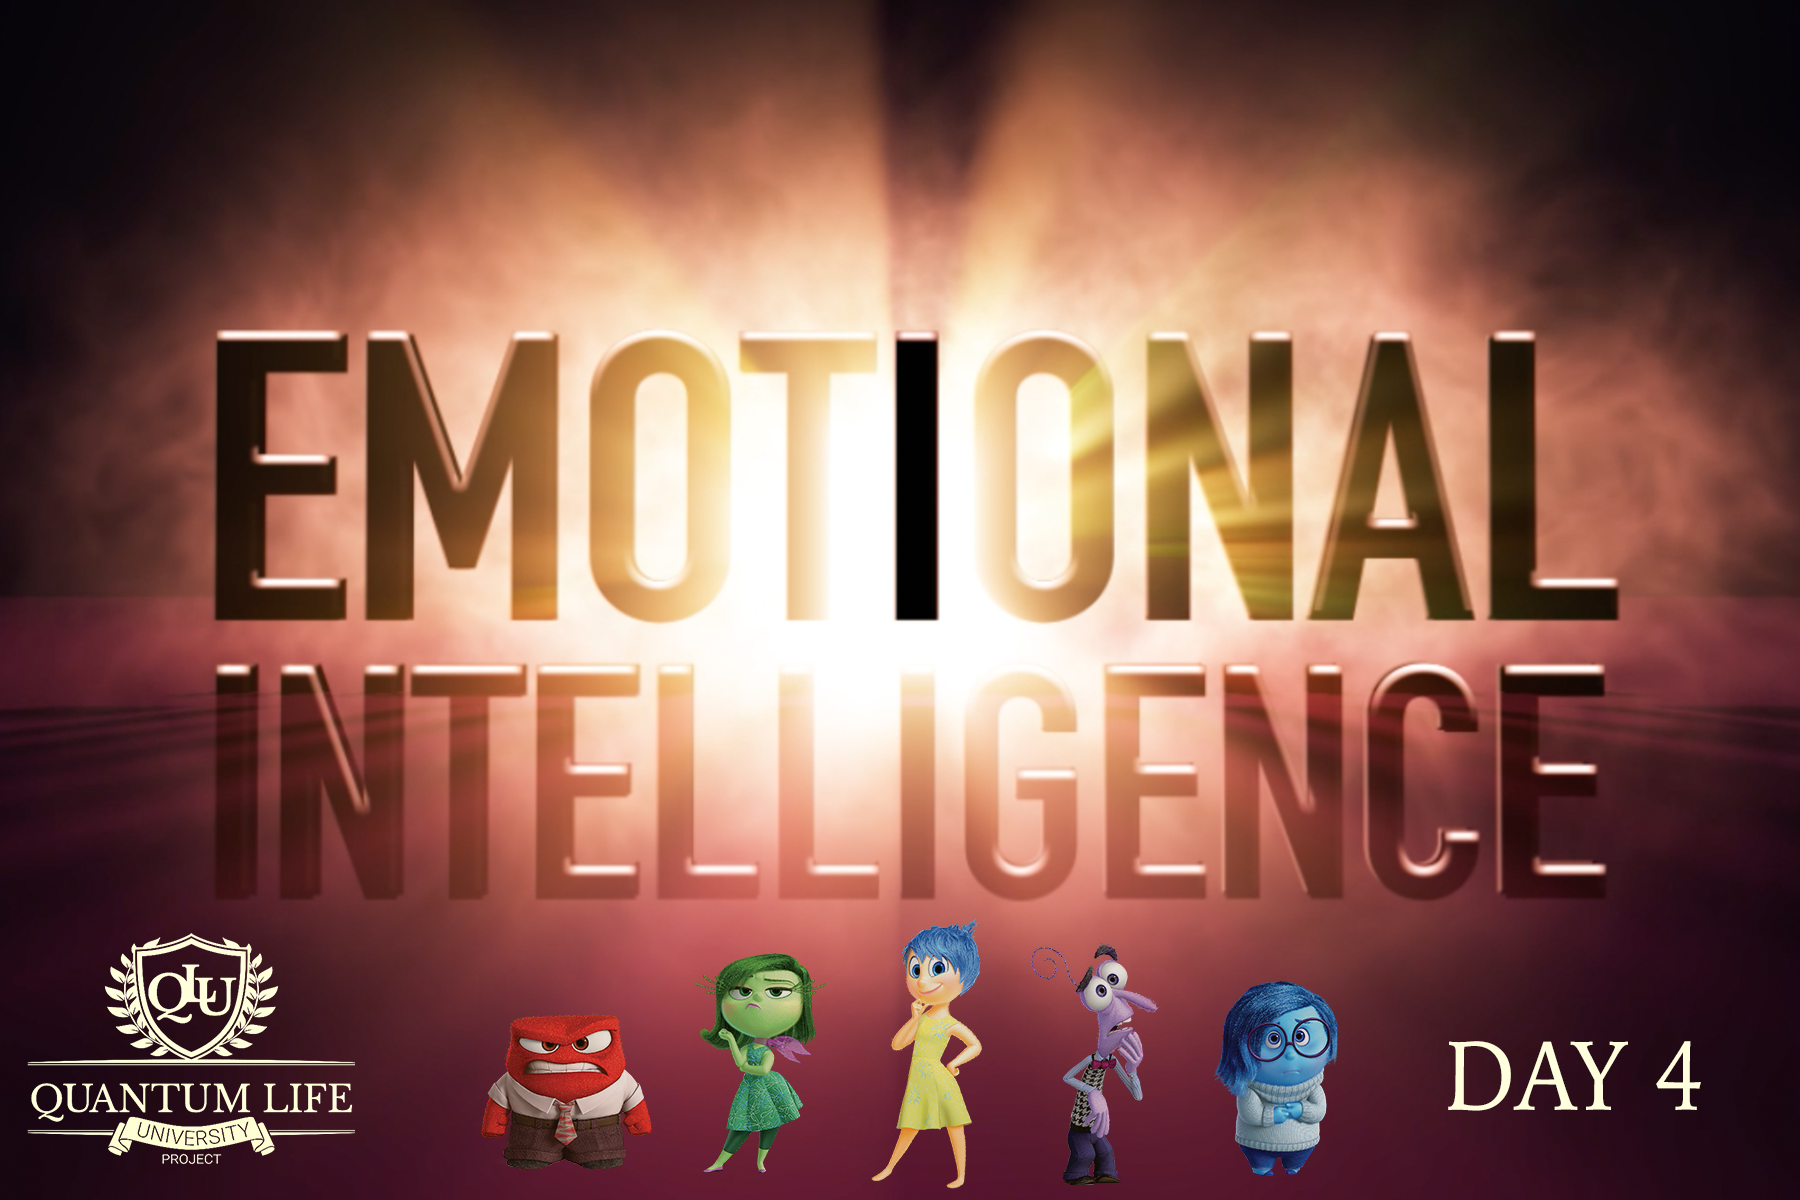 Emotional Intelligence Course day 4